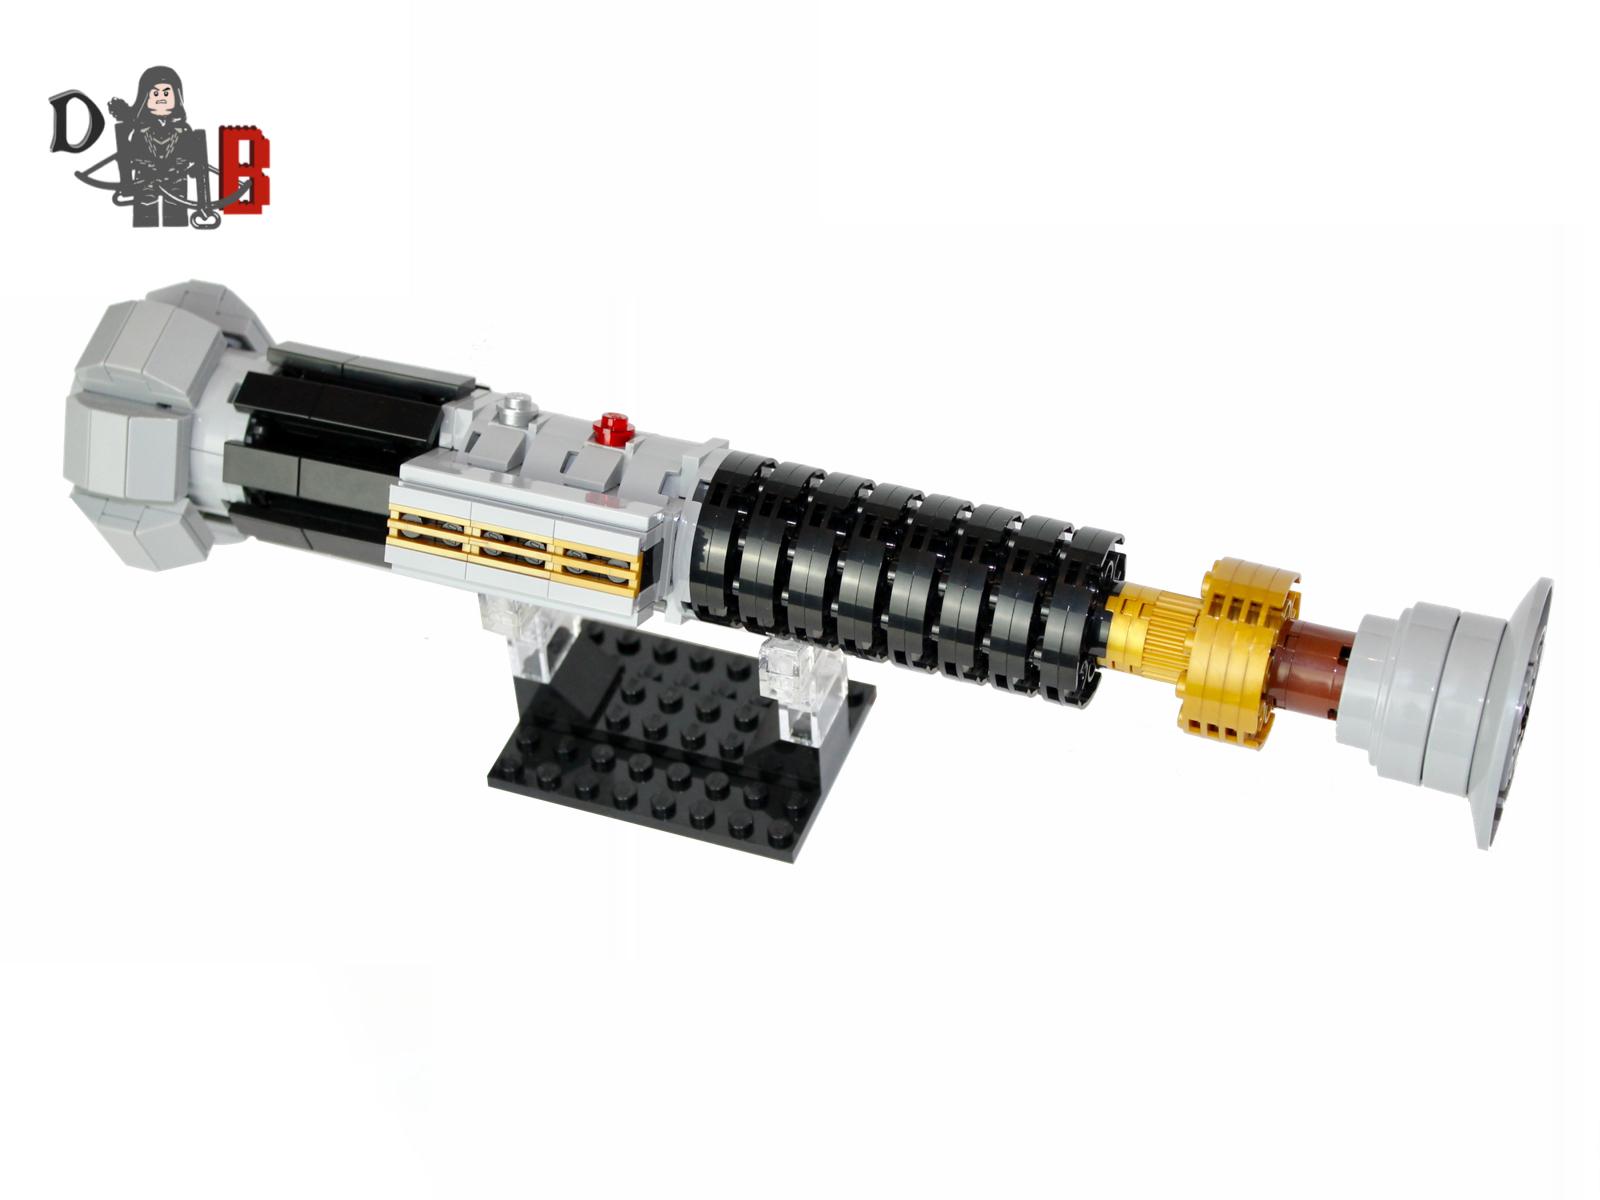 Star Wars Obi-Wan Kenobi's Lightsaber from Revenge of the Sith made using LEGO parts